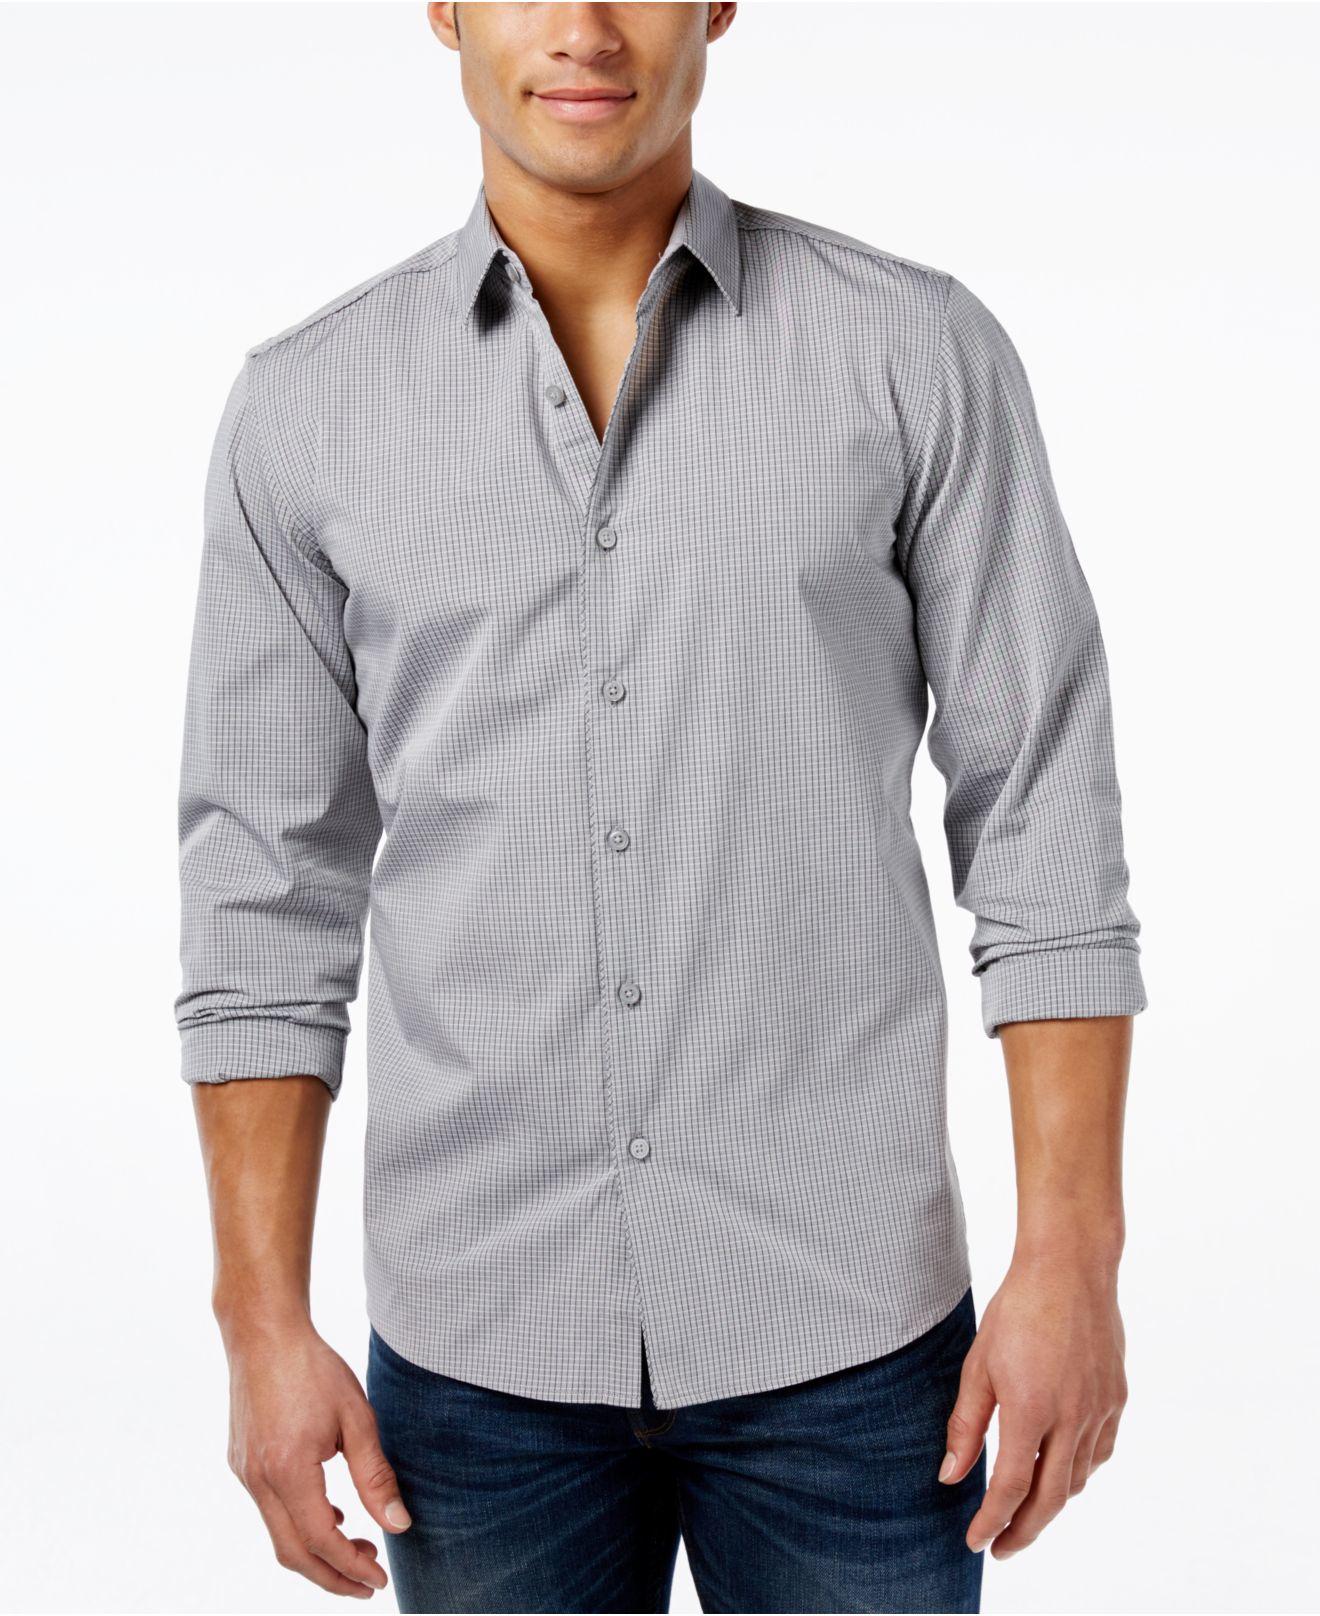 Kenneth Cole Black Men's Ribbed Shirt Dress